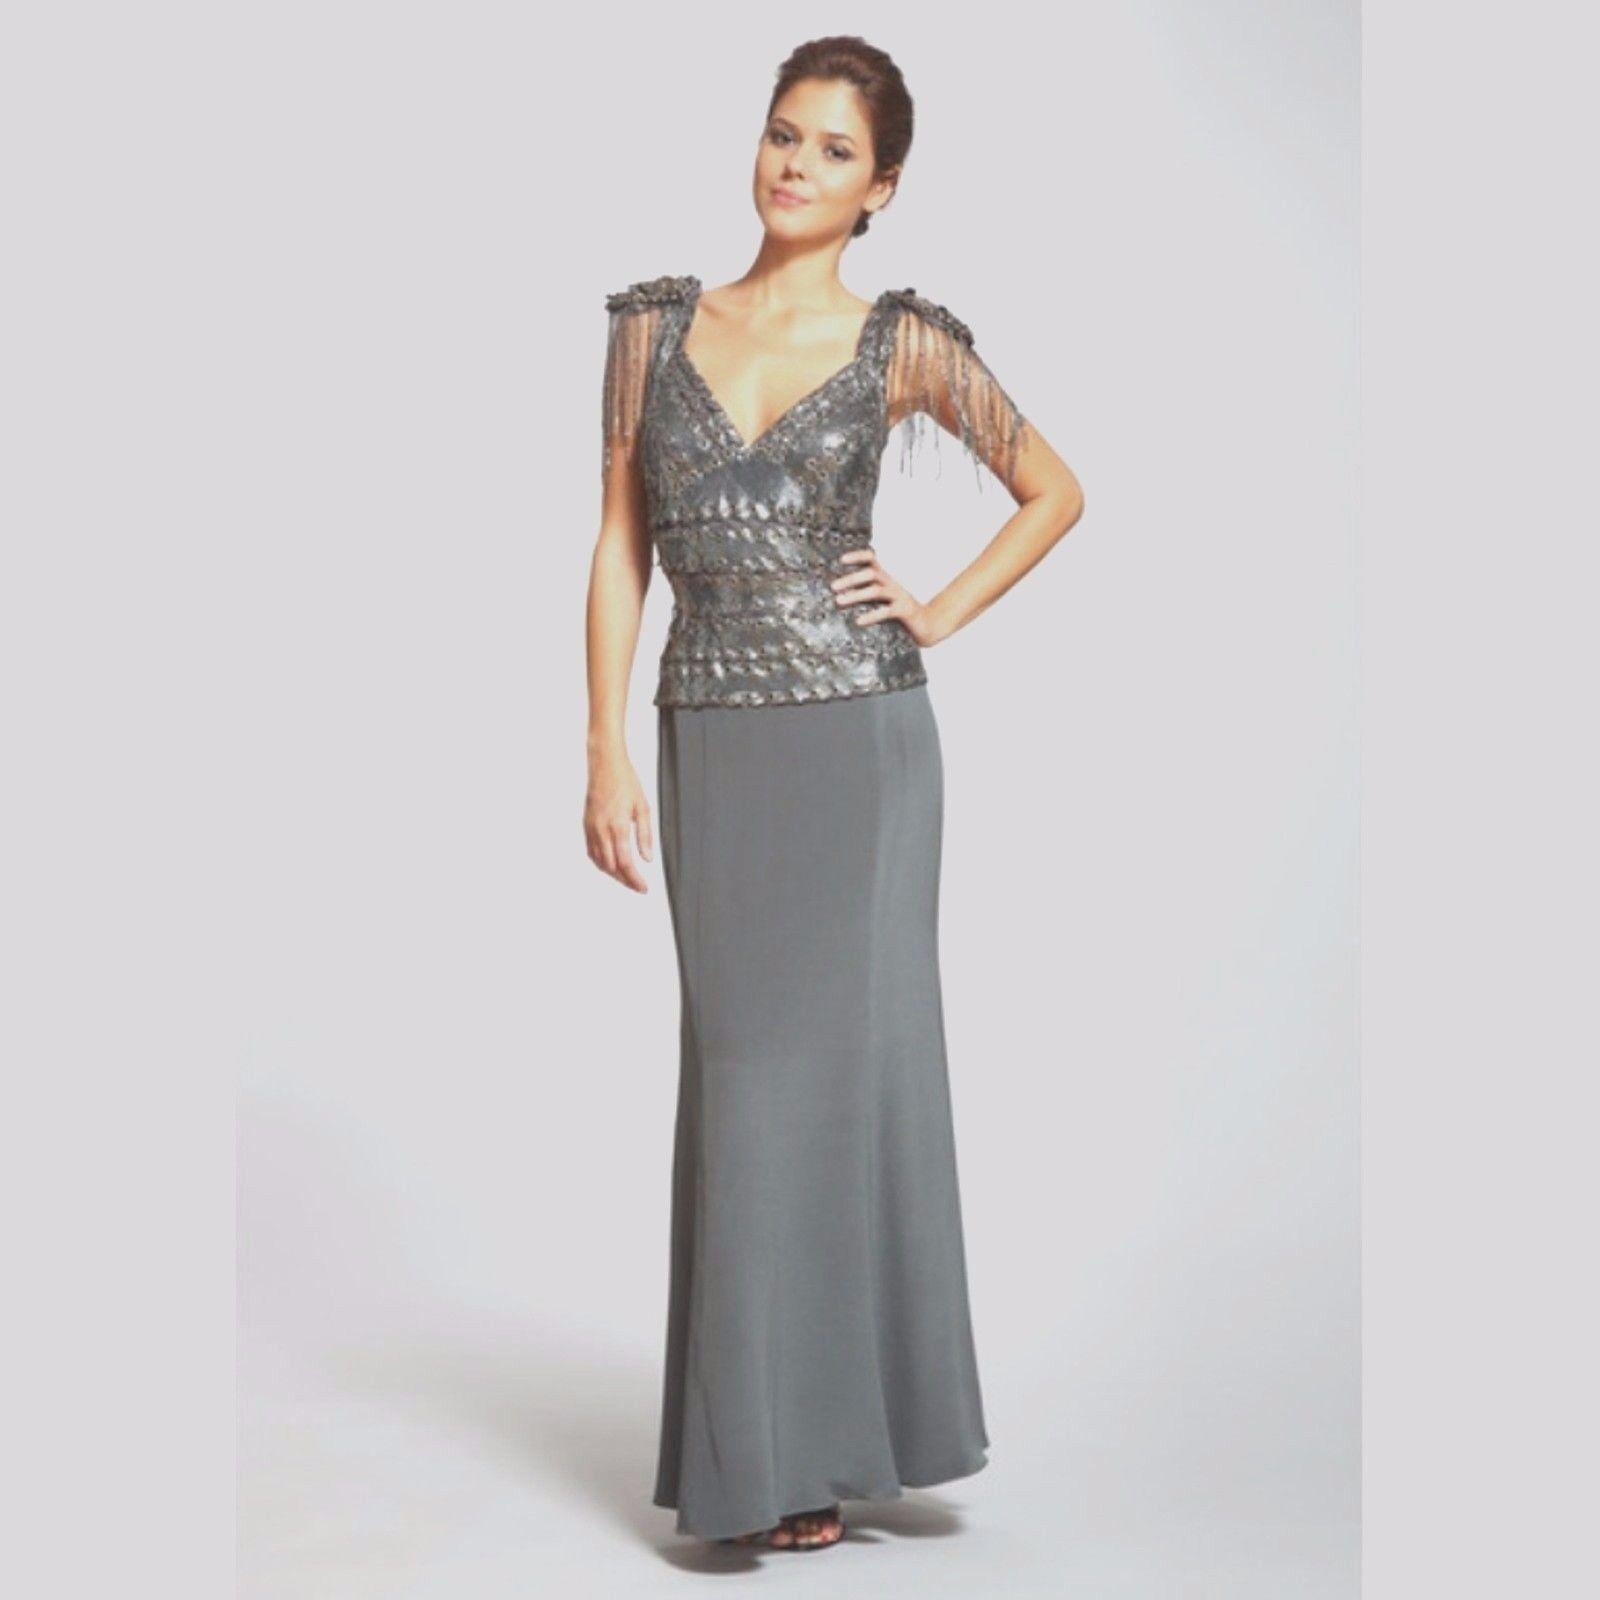 21dfbbbfc3f NWT BASIX occasion formal prom metallic epaulets fringe military dress 10